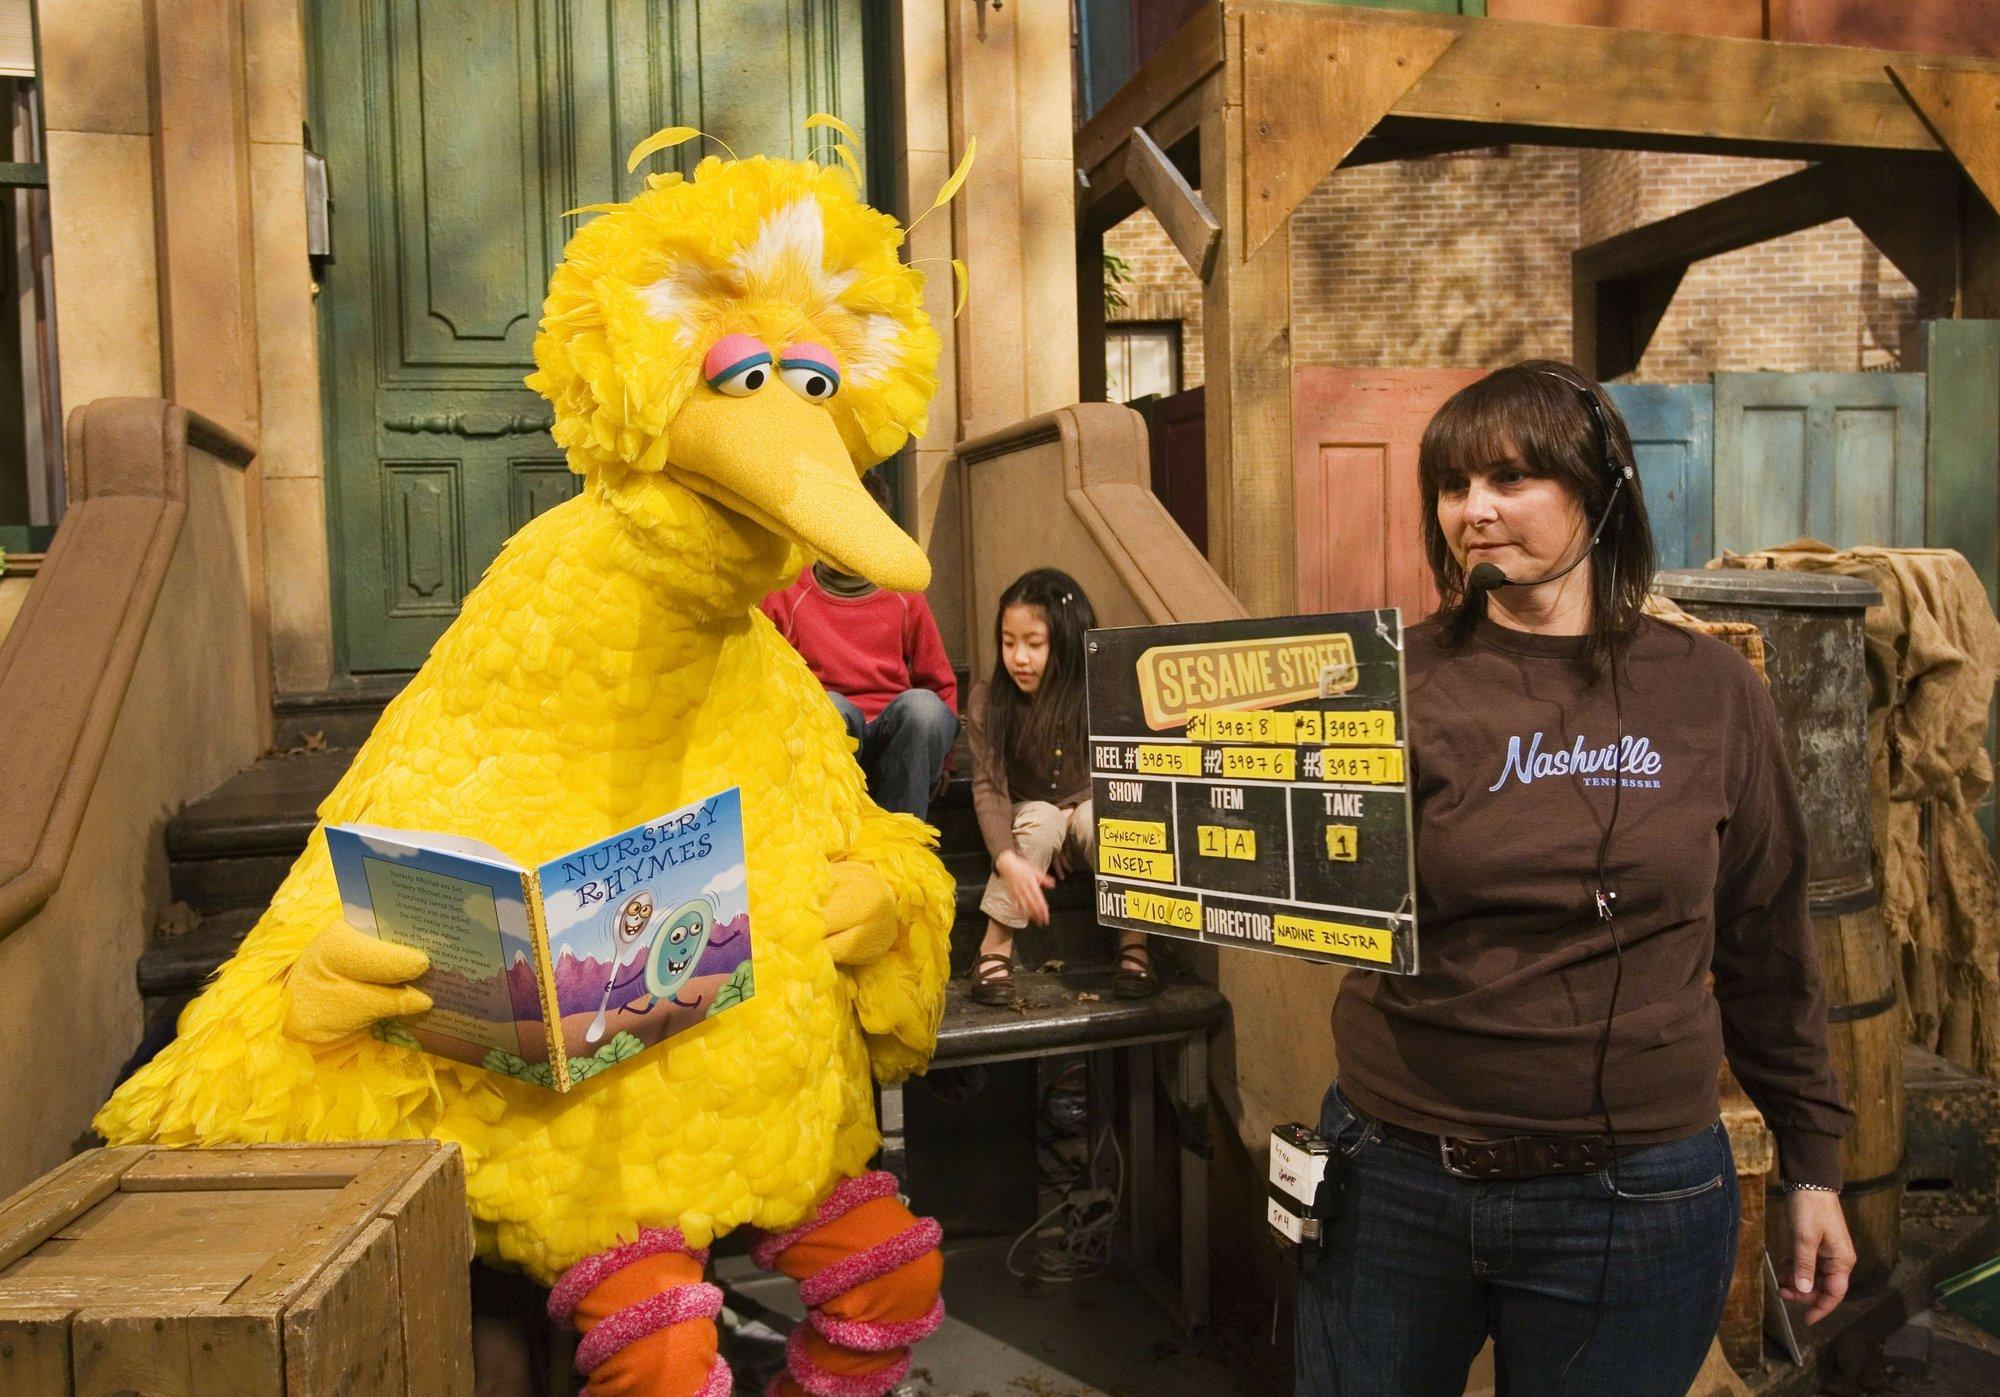 Puppeteer who played Big Bird on 'Sesame Street' retiring